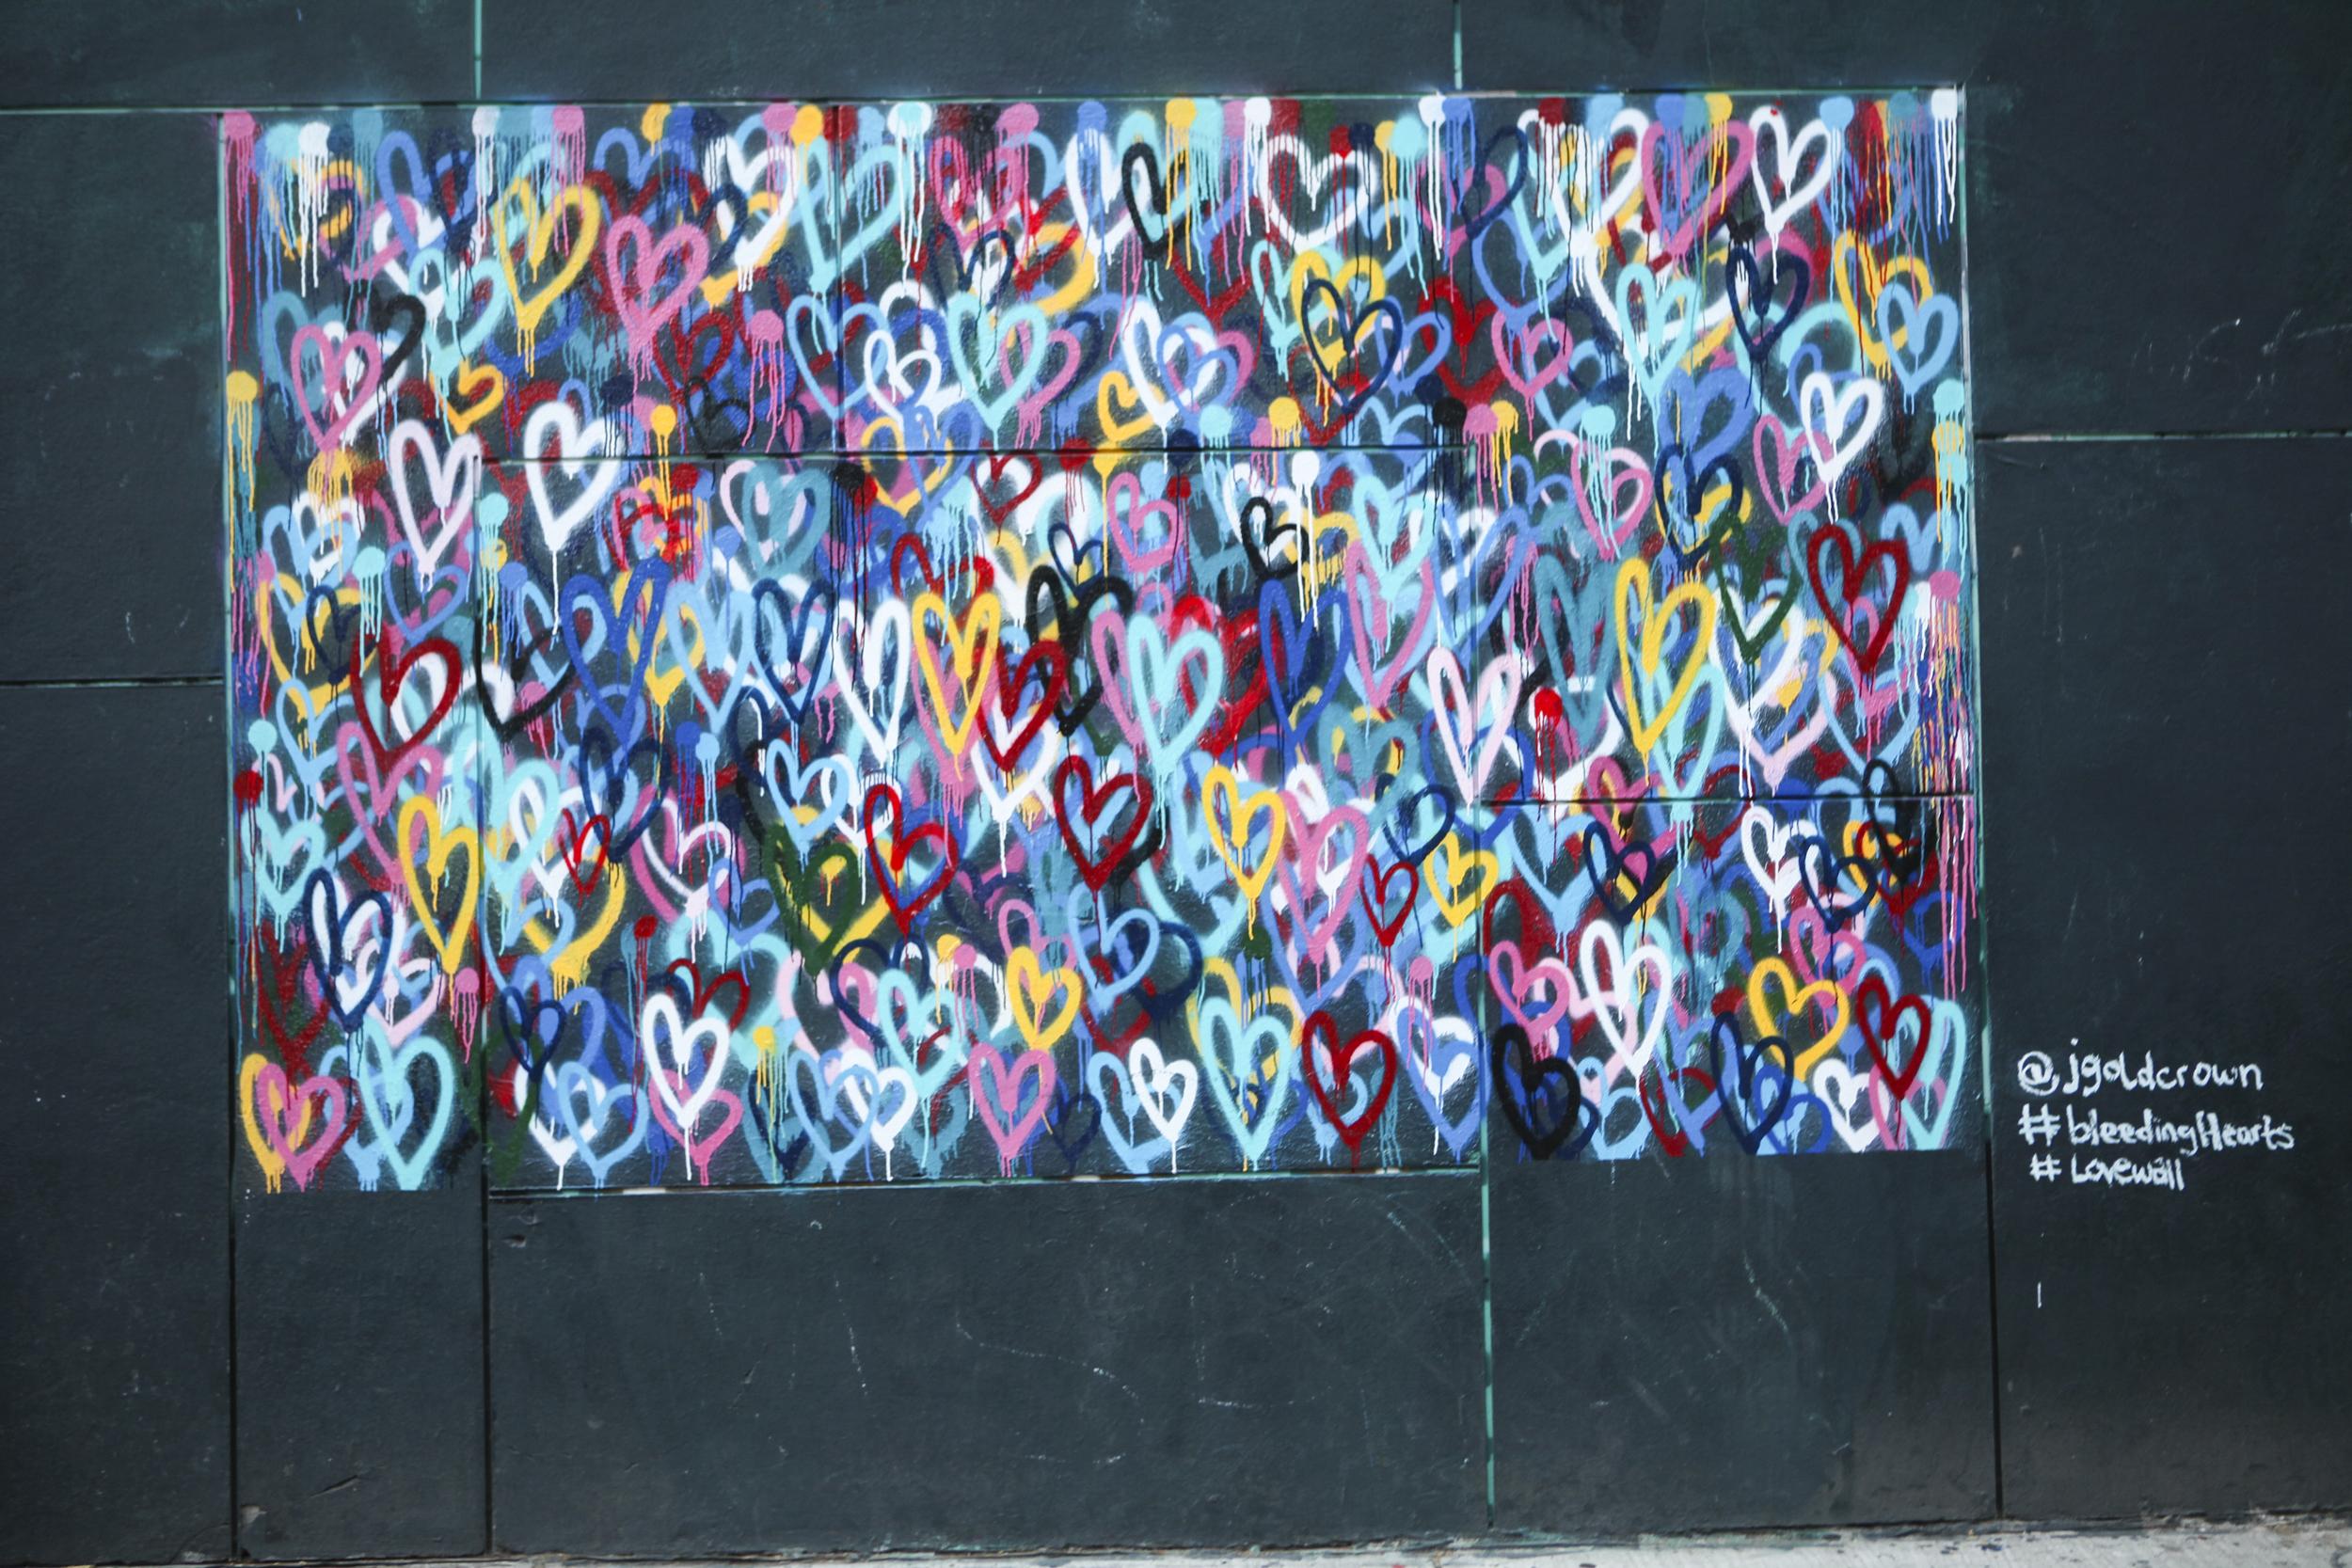 bleeding_hearts_mural_soho_nyc.jpg